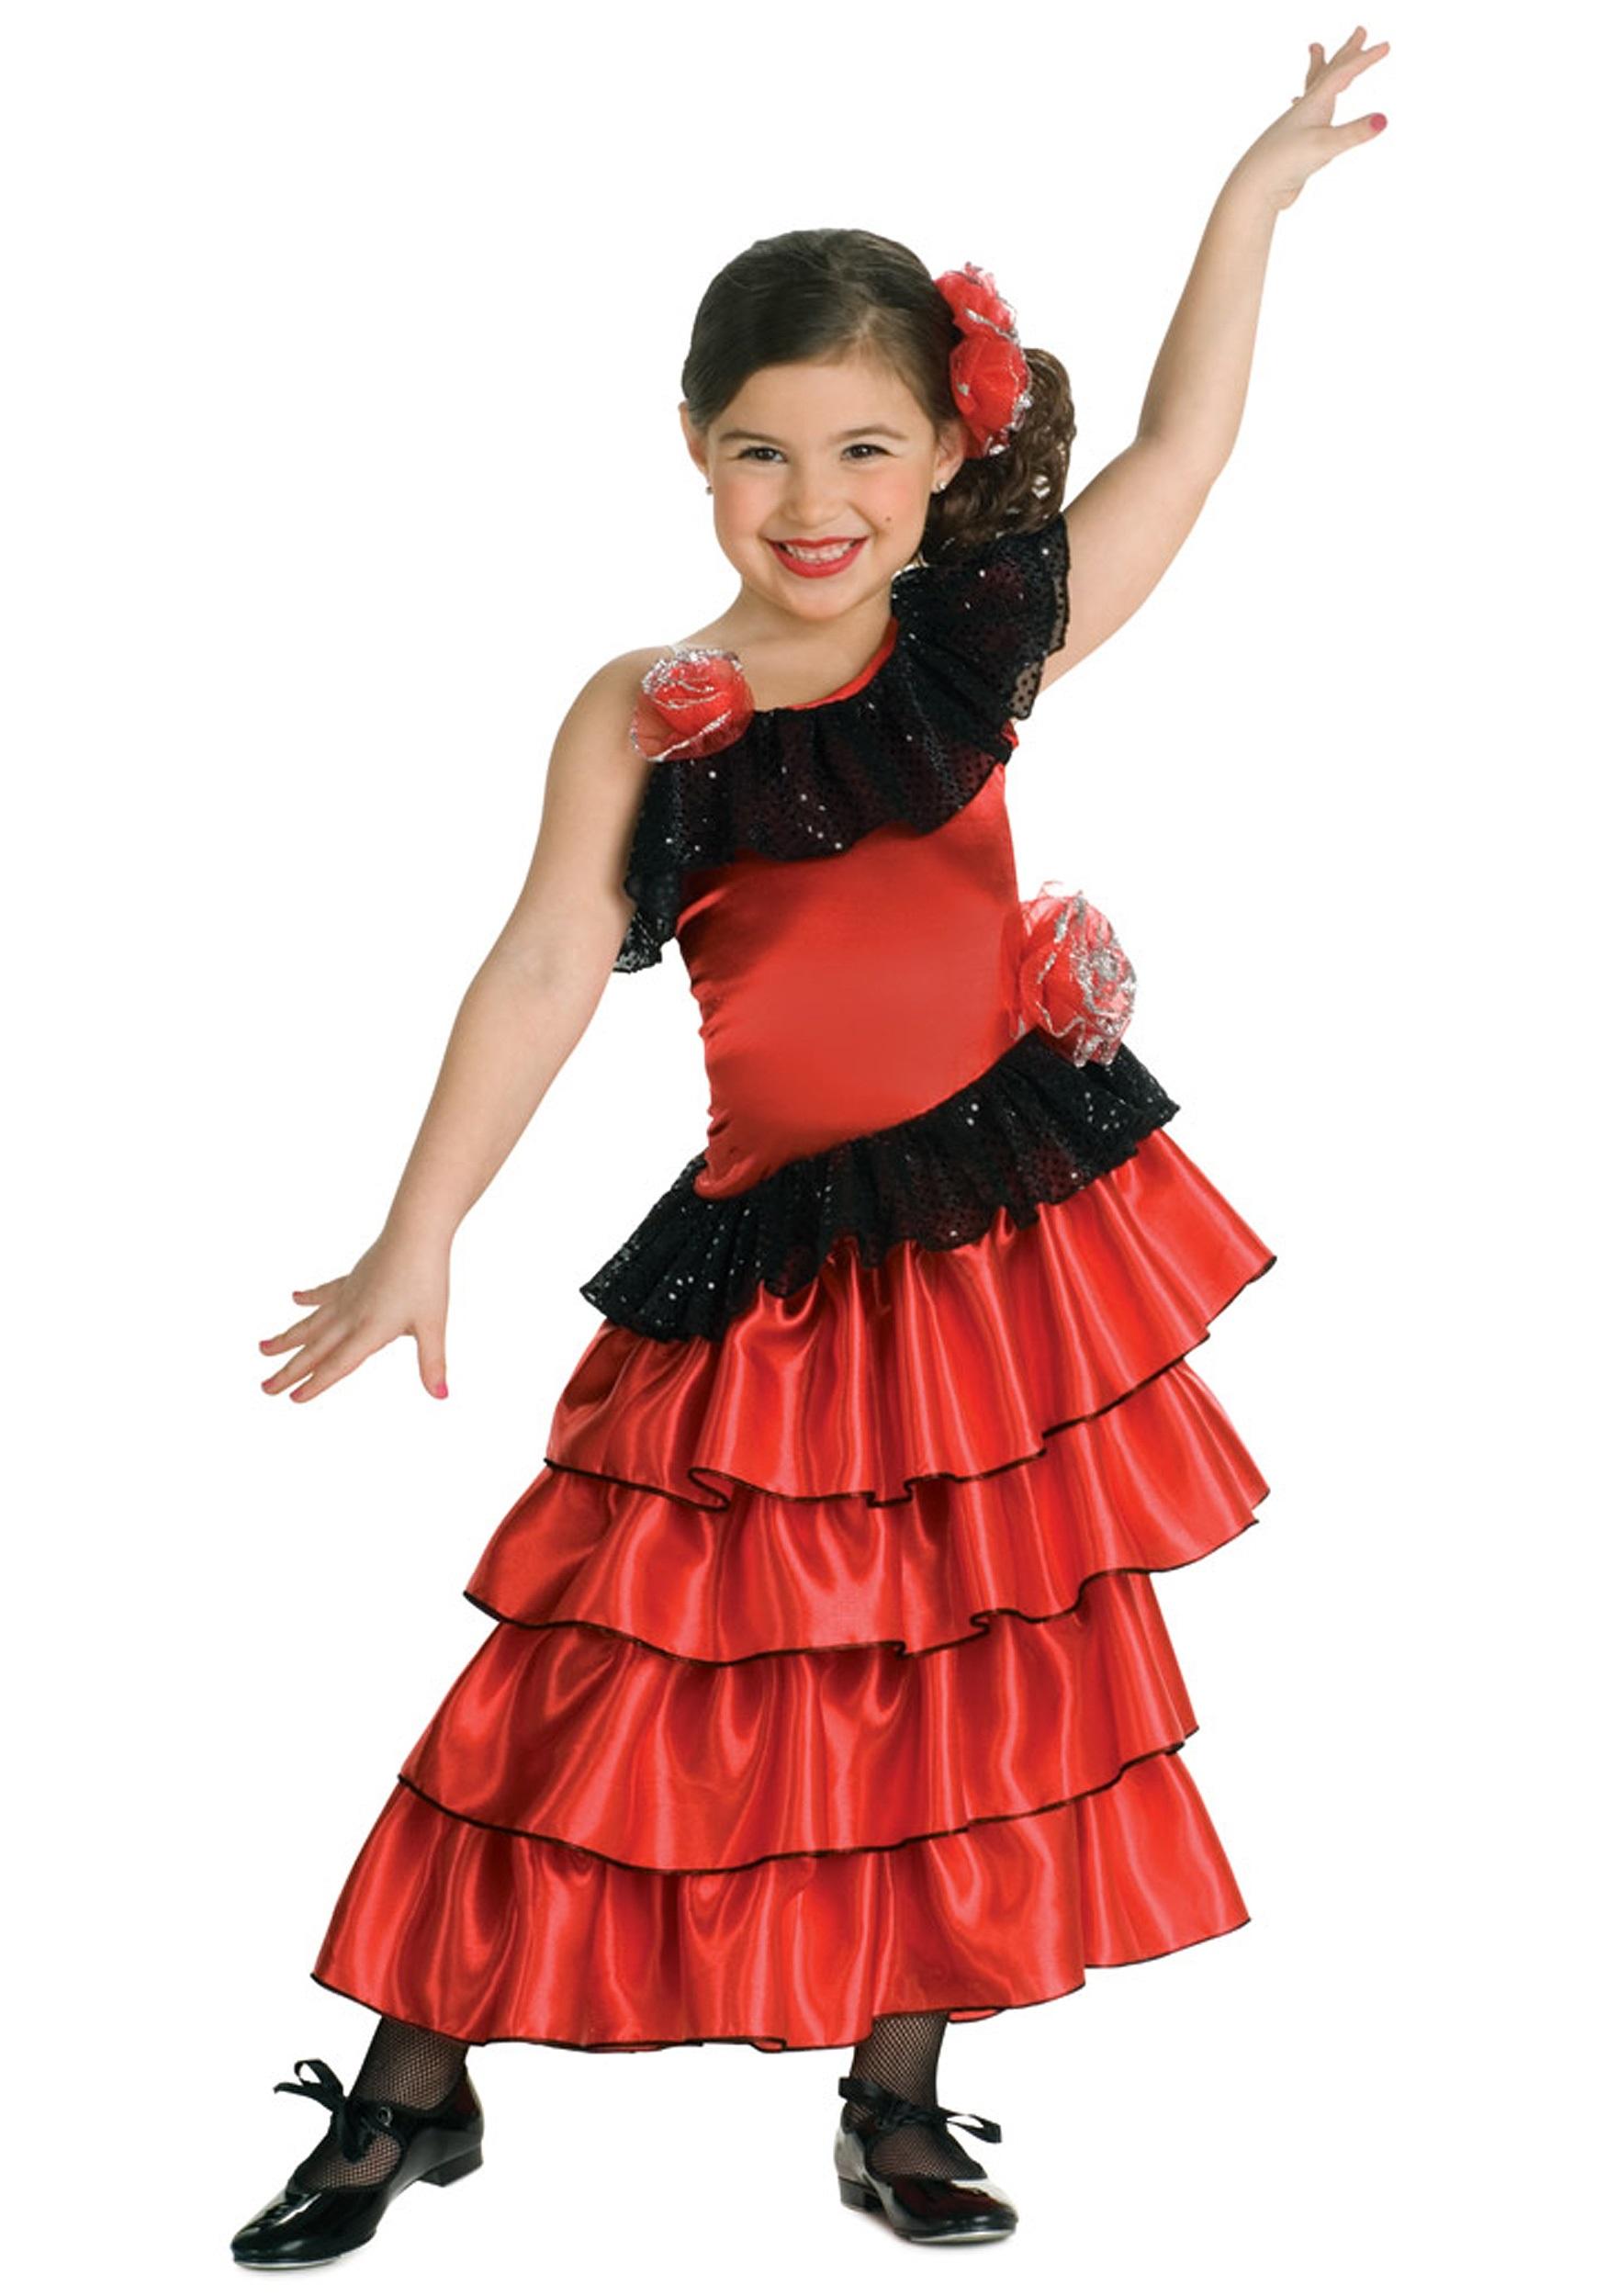 62f072a46ed9 Child Spanish Flamenco Dancer Costume- Spanish Flamenco Dancer Costume